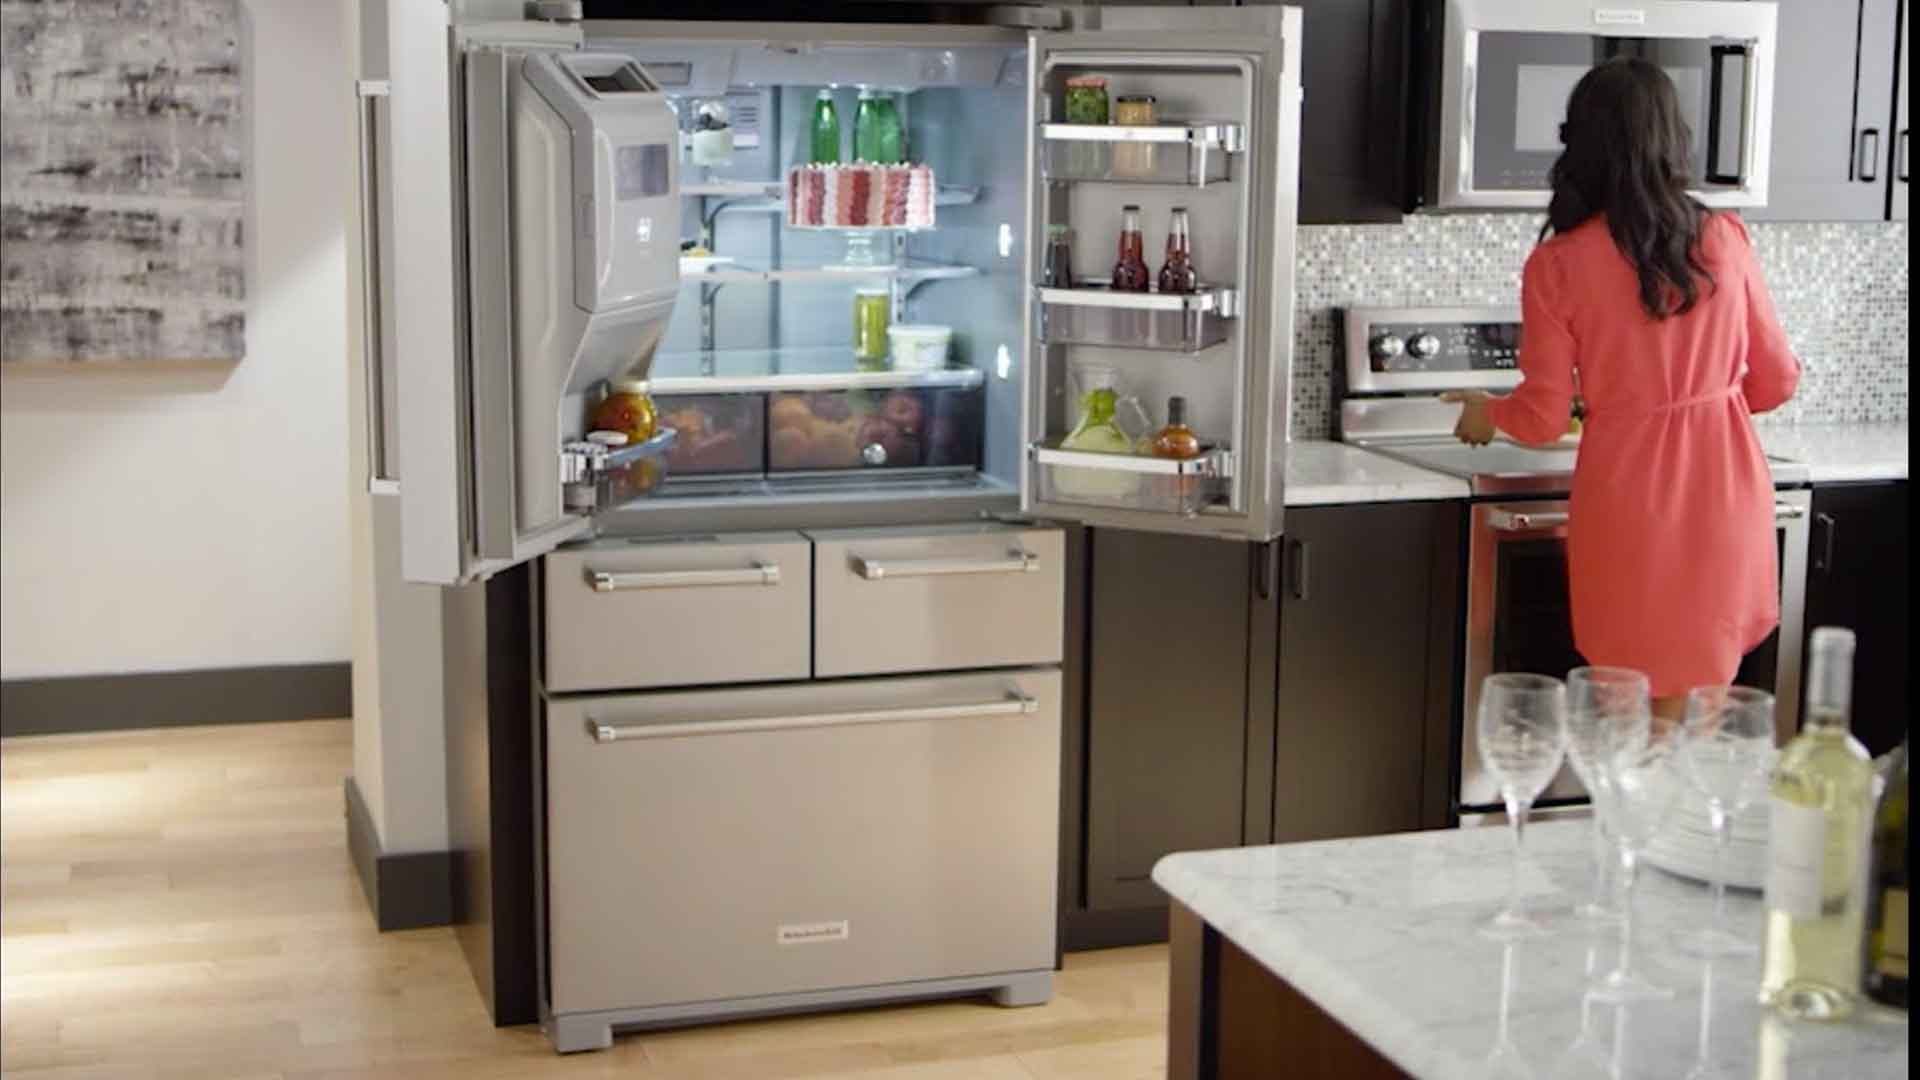 Kitchenaid Refrigerator Repair Service | Kitchenaid Repairs